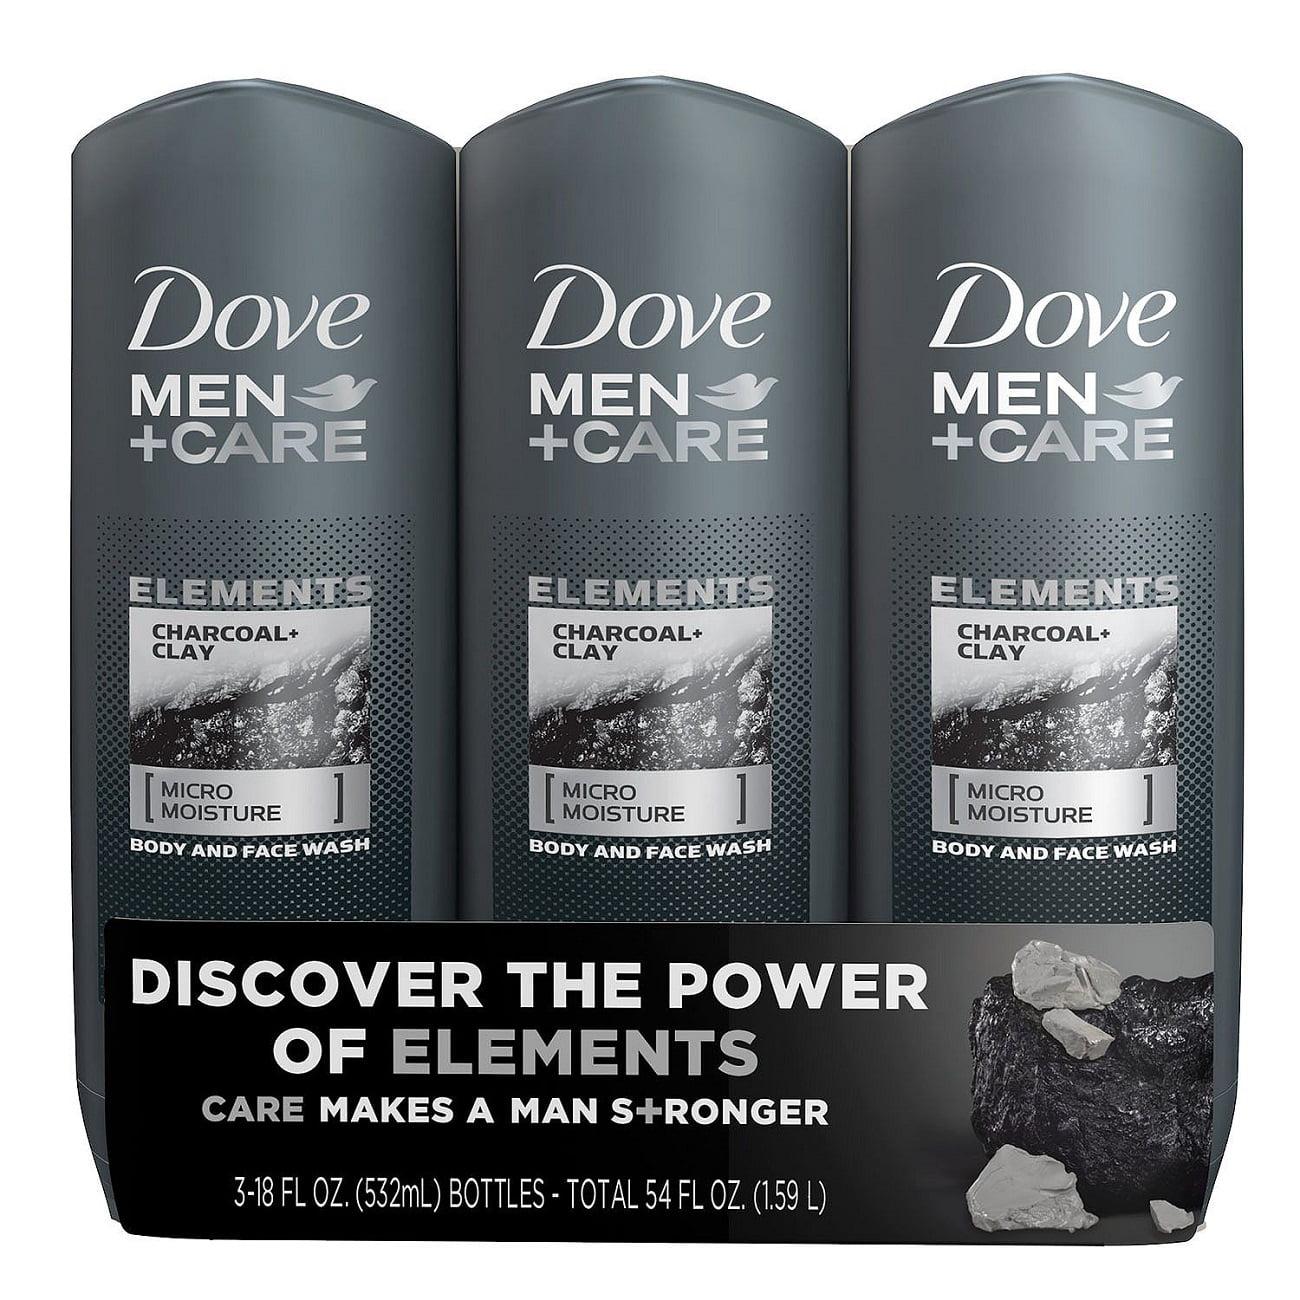 Dove Men+Care Body Wash, Charcoal+Clay (18 fl. oz., 3 pk.)